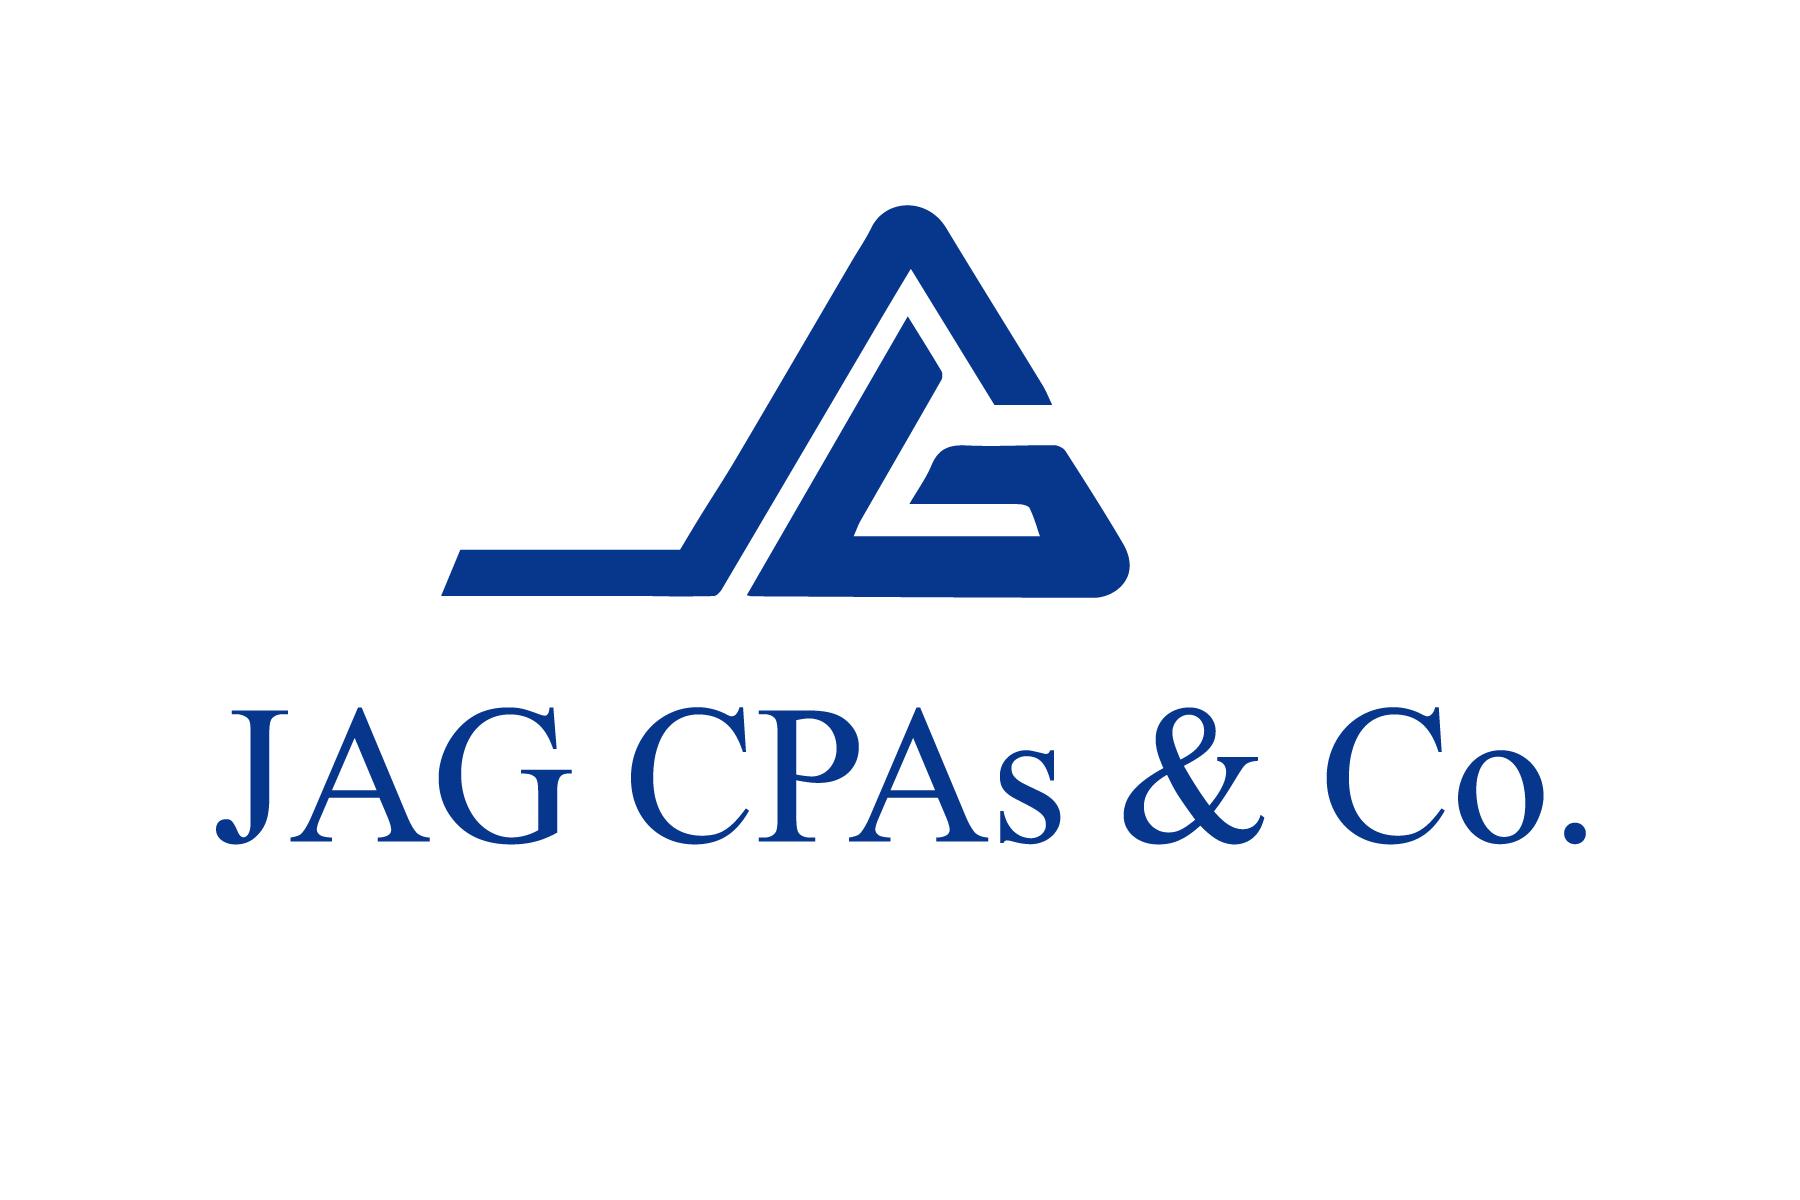 Jagcpa logo2